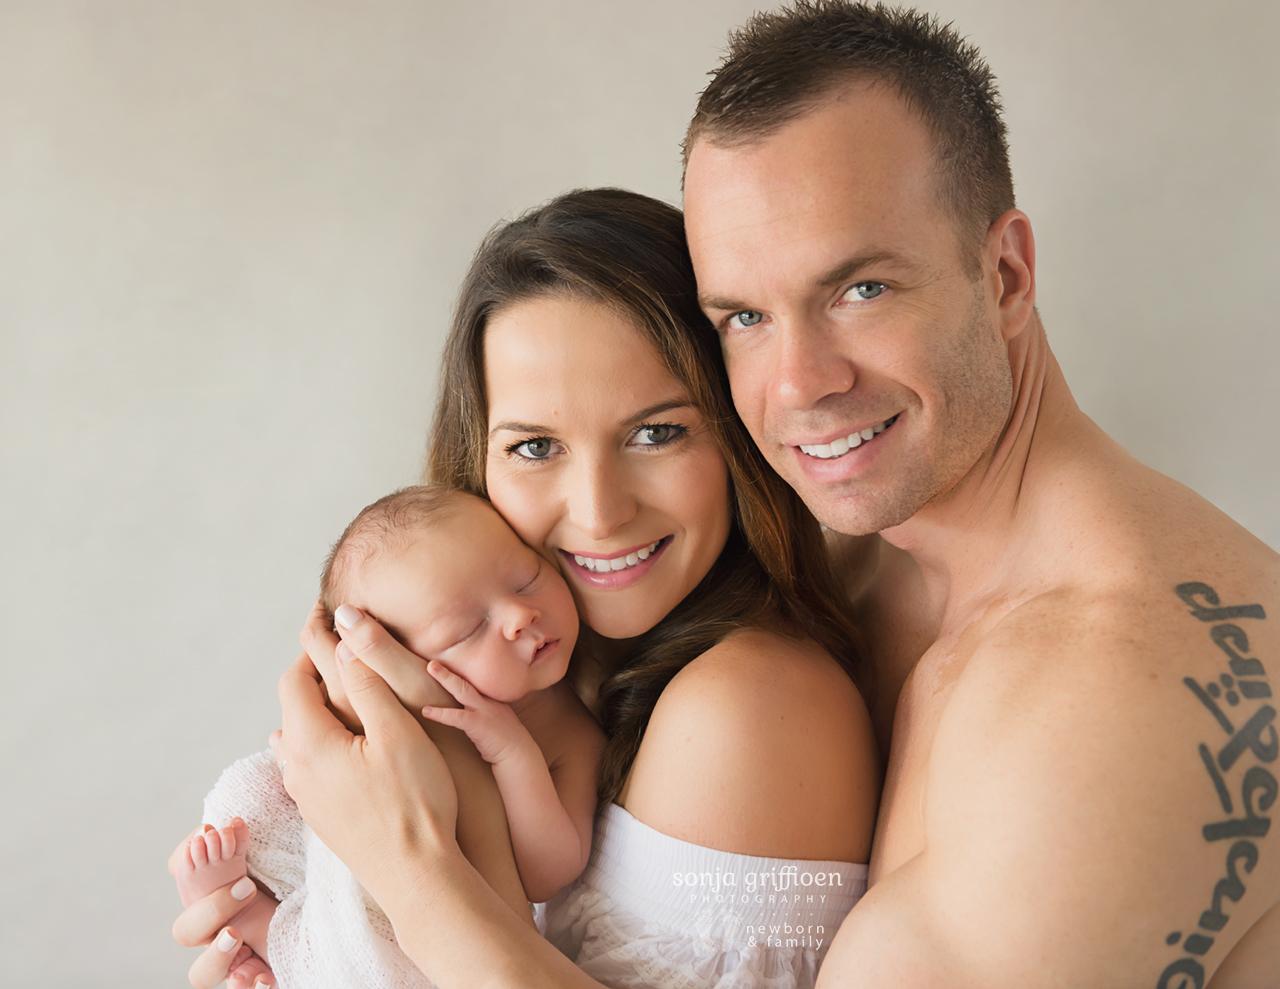 Bobby-Newborn-Brisbane-Newborn-Photographer-Sonja-Griffioen-09.jpg